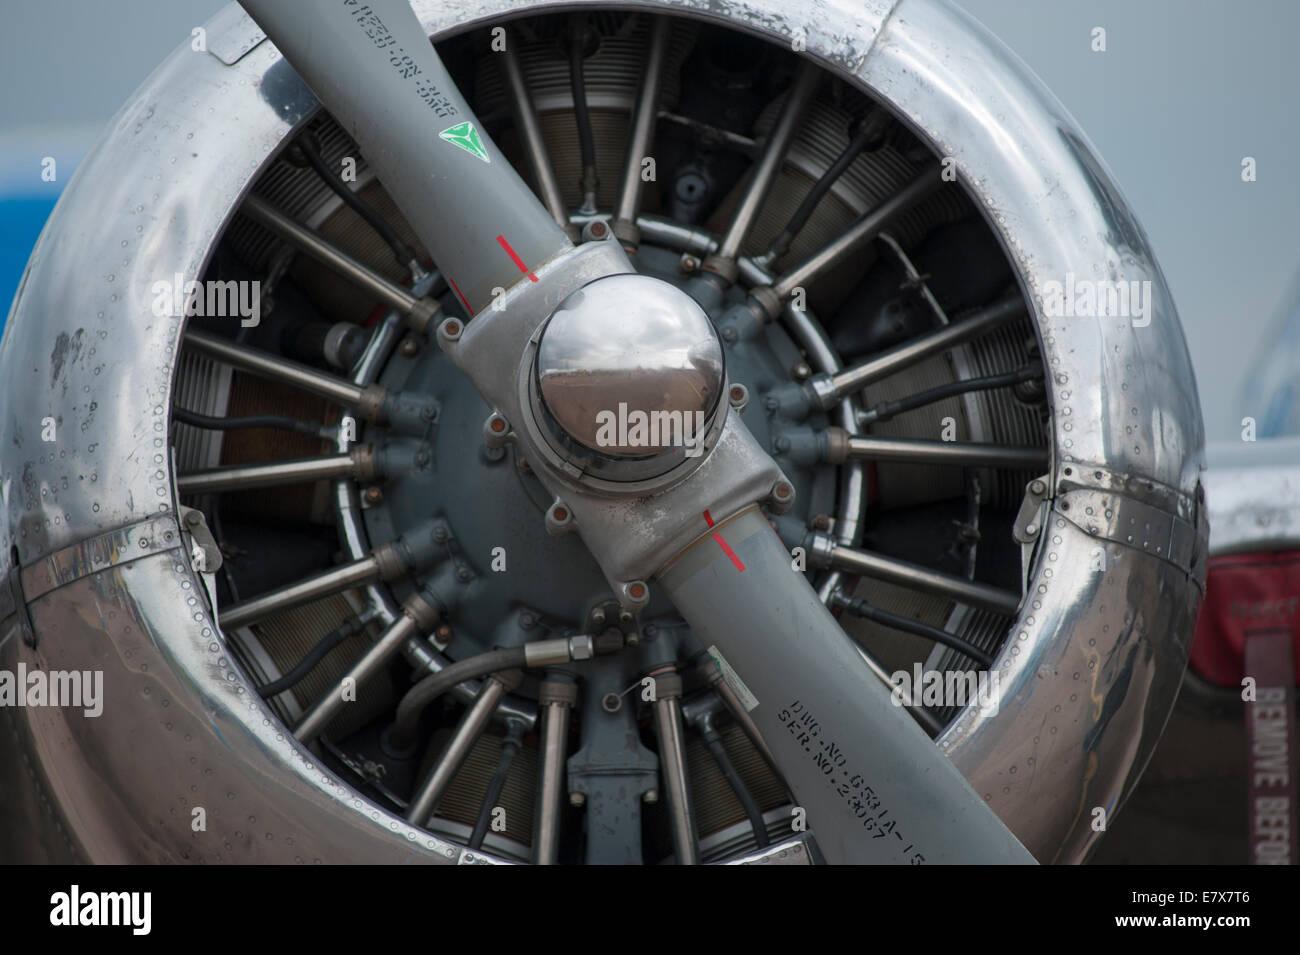 Piston Engine Aircraft Stock Photos & Piston Engine Aircraft